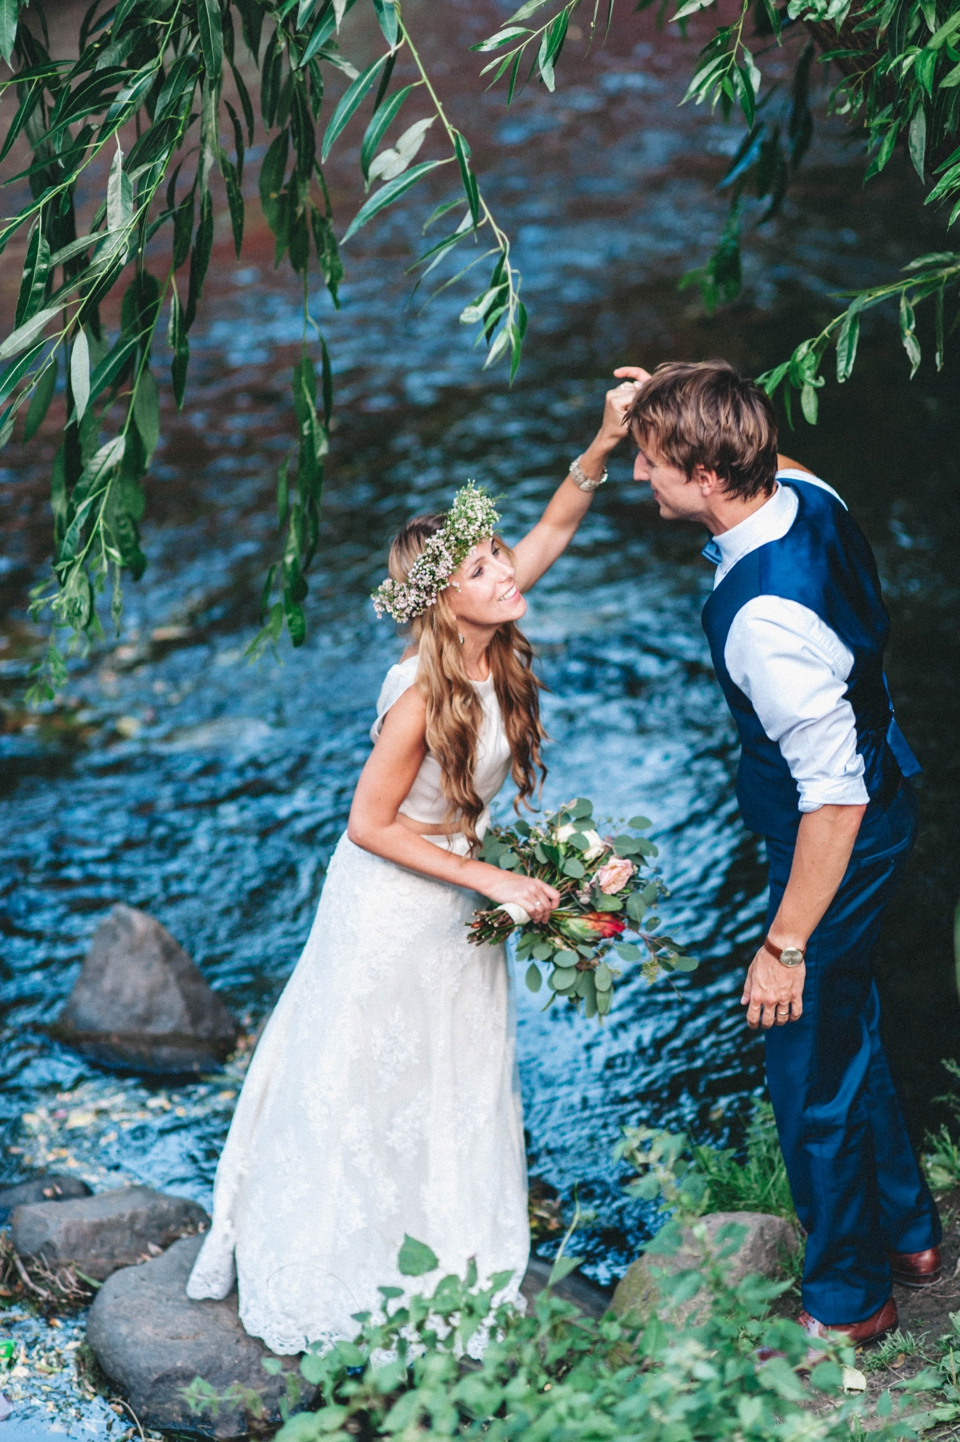 rembostyling-weddinginspiration-kreativ-wedding-wedding-belin-loft23_0428